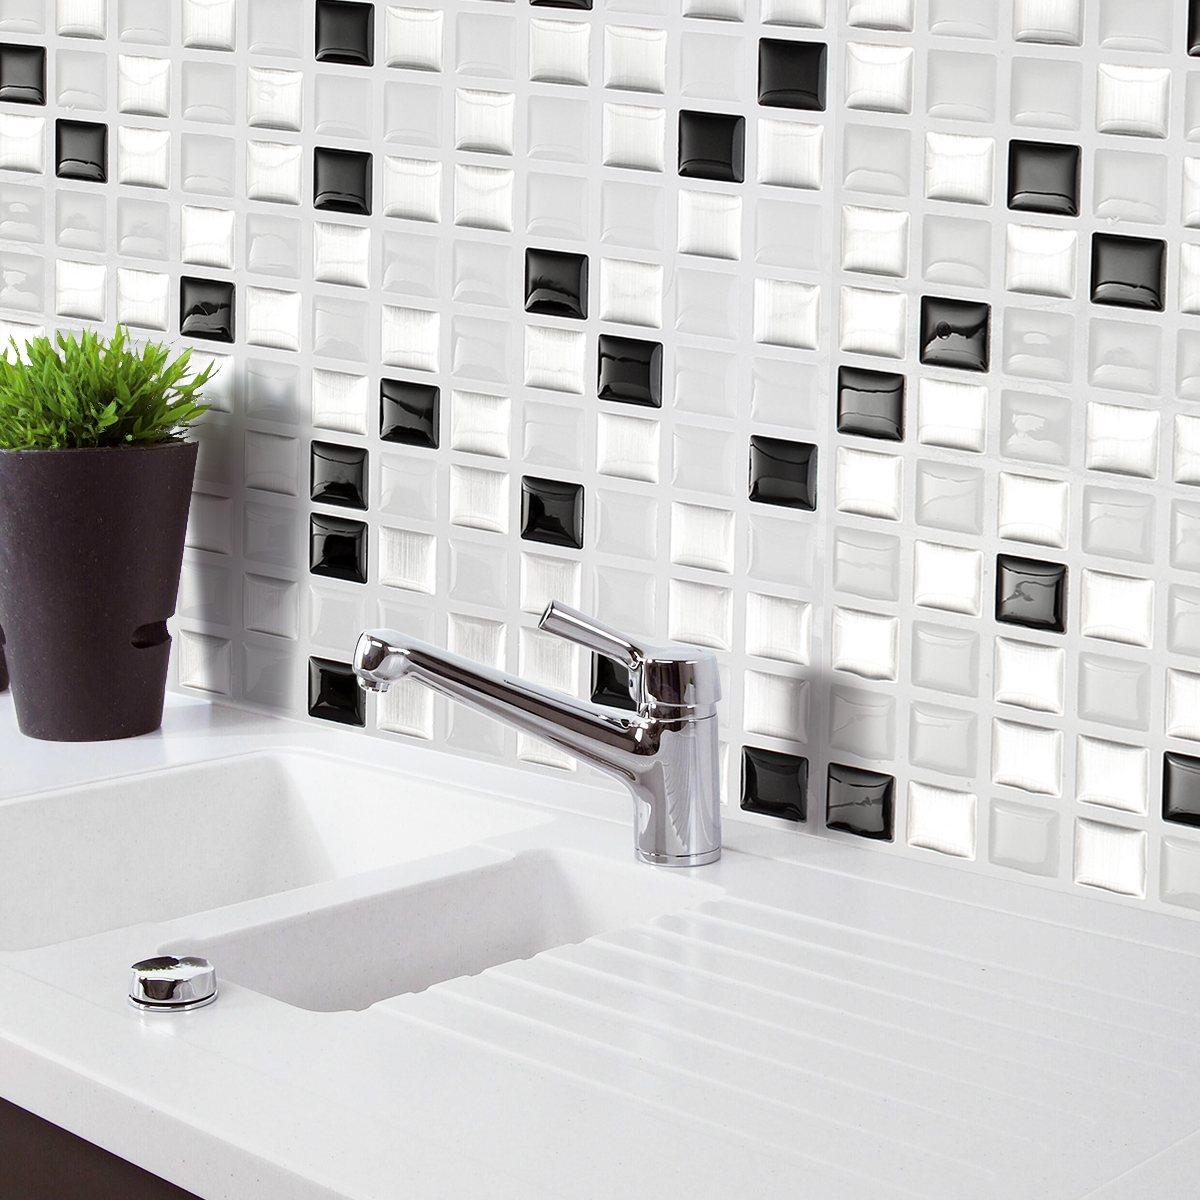 25 X 25cm Home Decor Brick Kitchen Bathroom Foil Beauty 3D Wallpaper ...